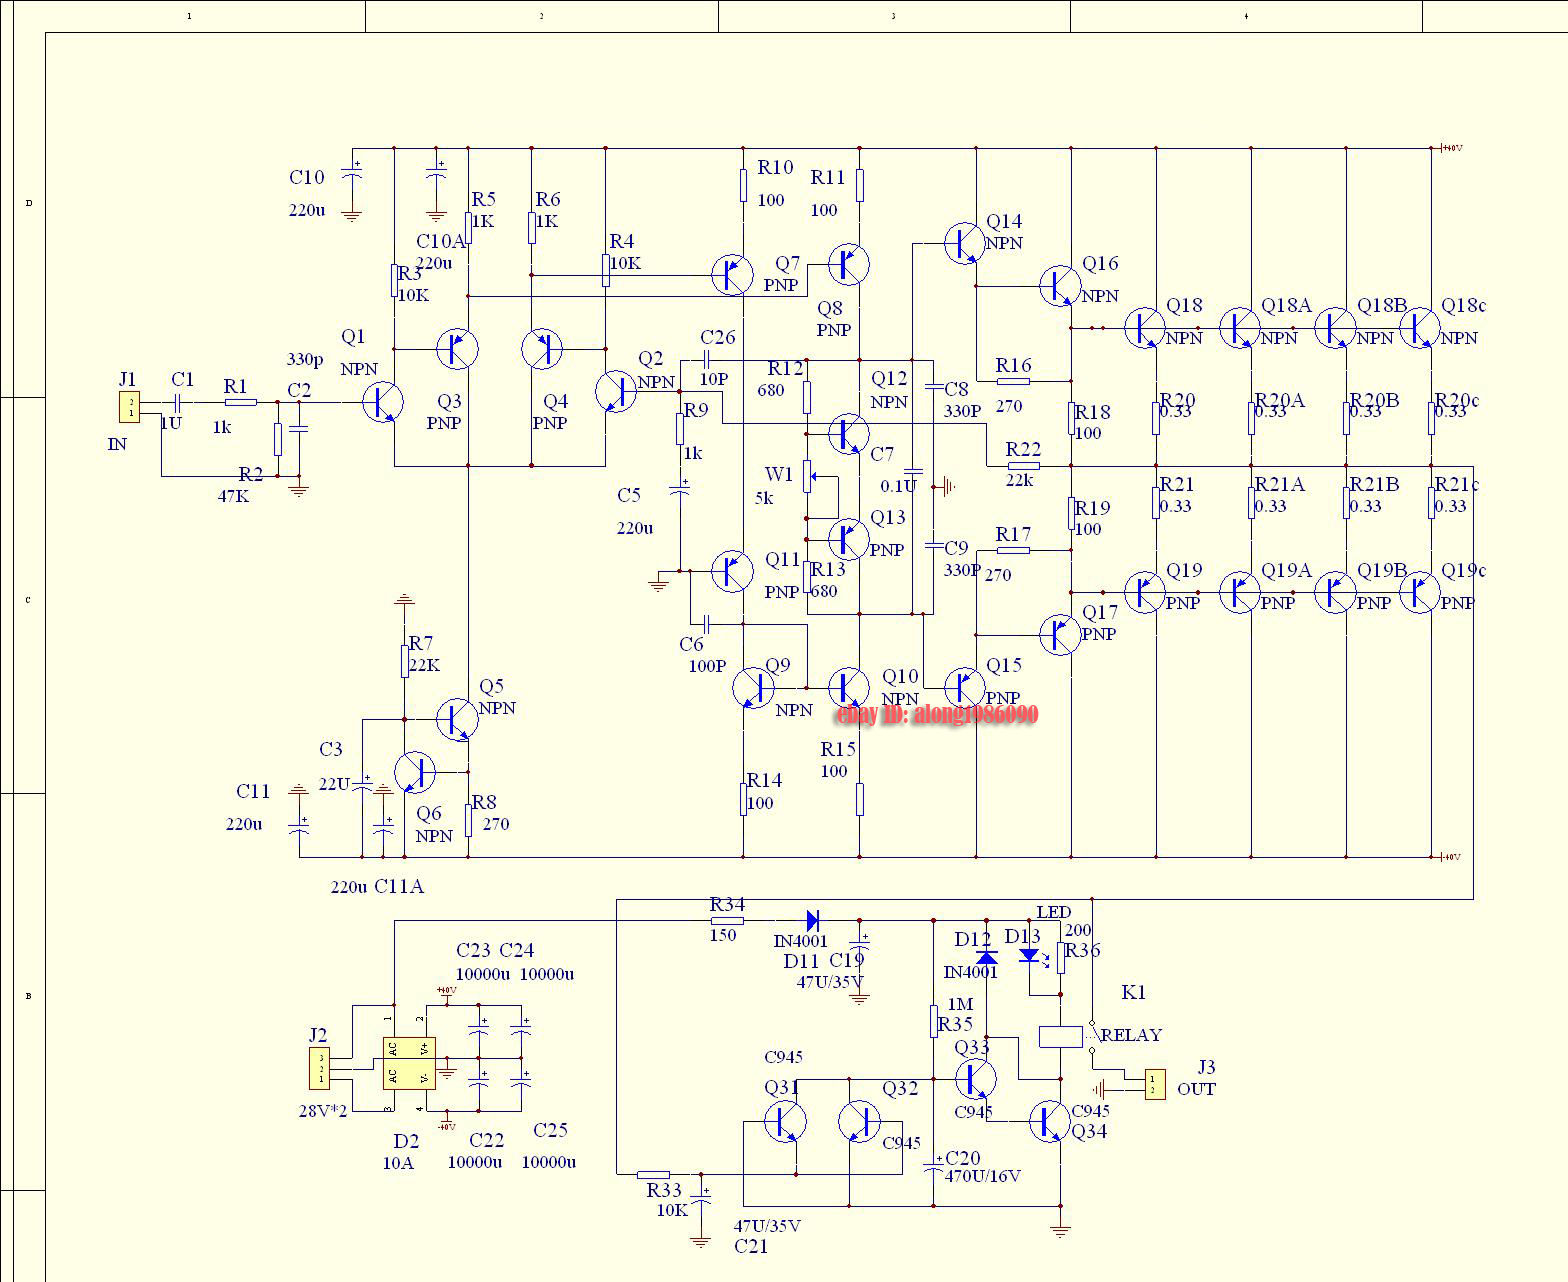 hight resolution of cyrus 1 circuit diagram wiring diagram split cyrus 1 circuit diagram